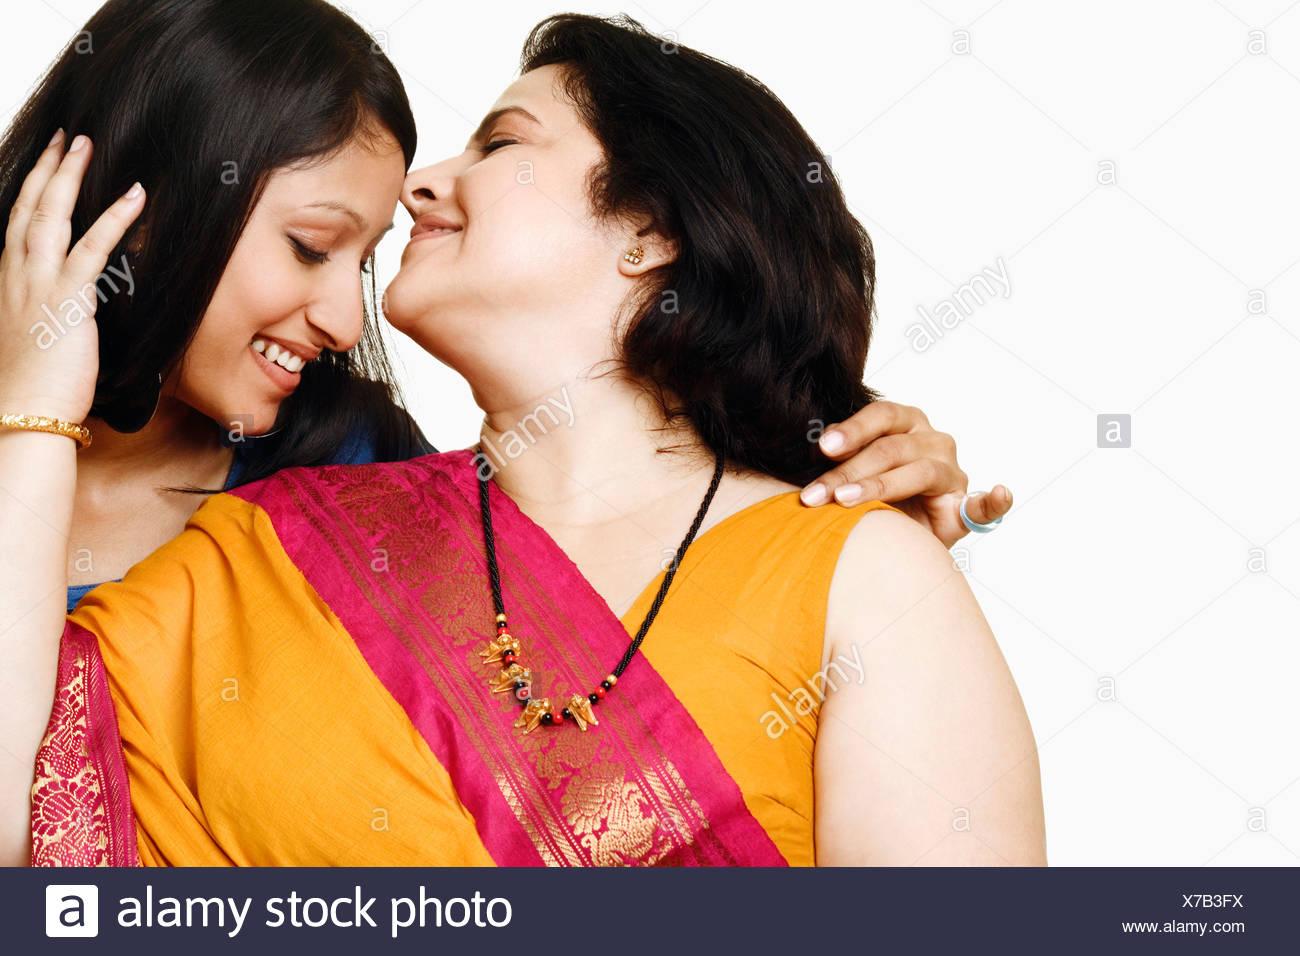 cumshot-mature-women-kissing-girls